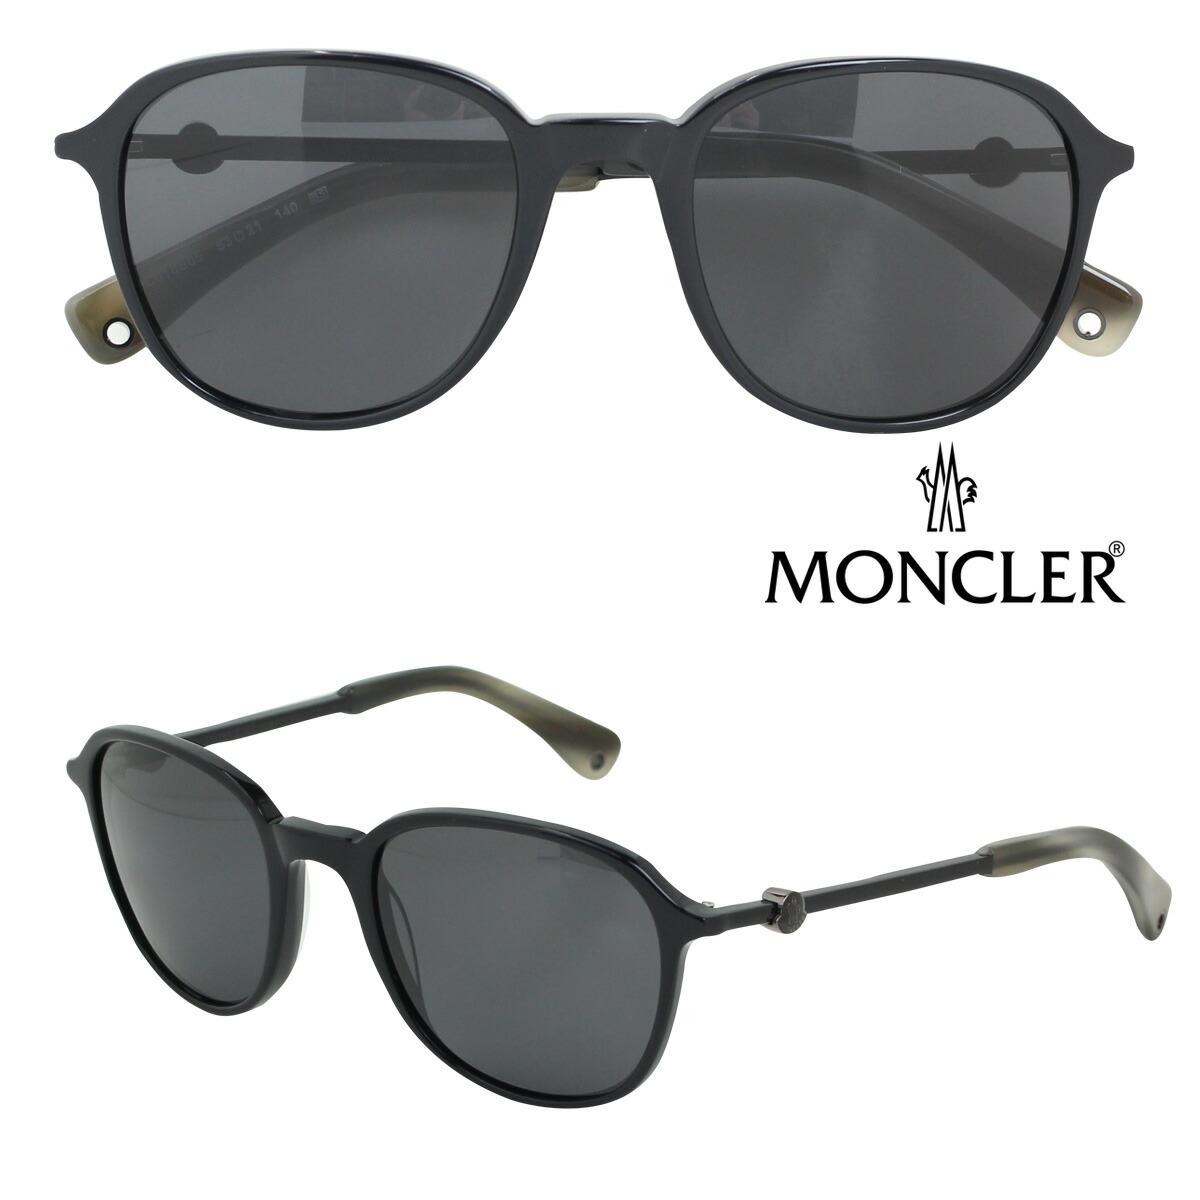 46e11a02e13 Sunglasses Made In Italy « One More Soul